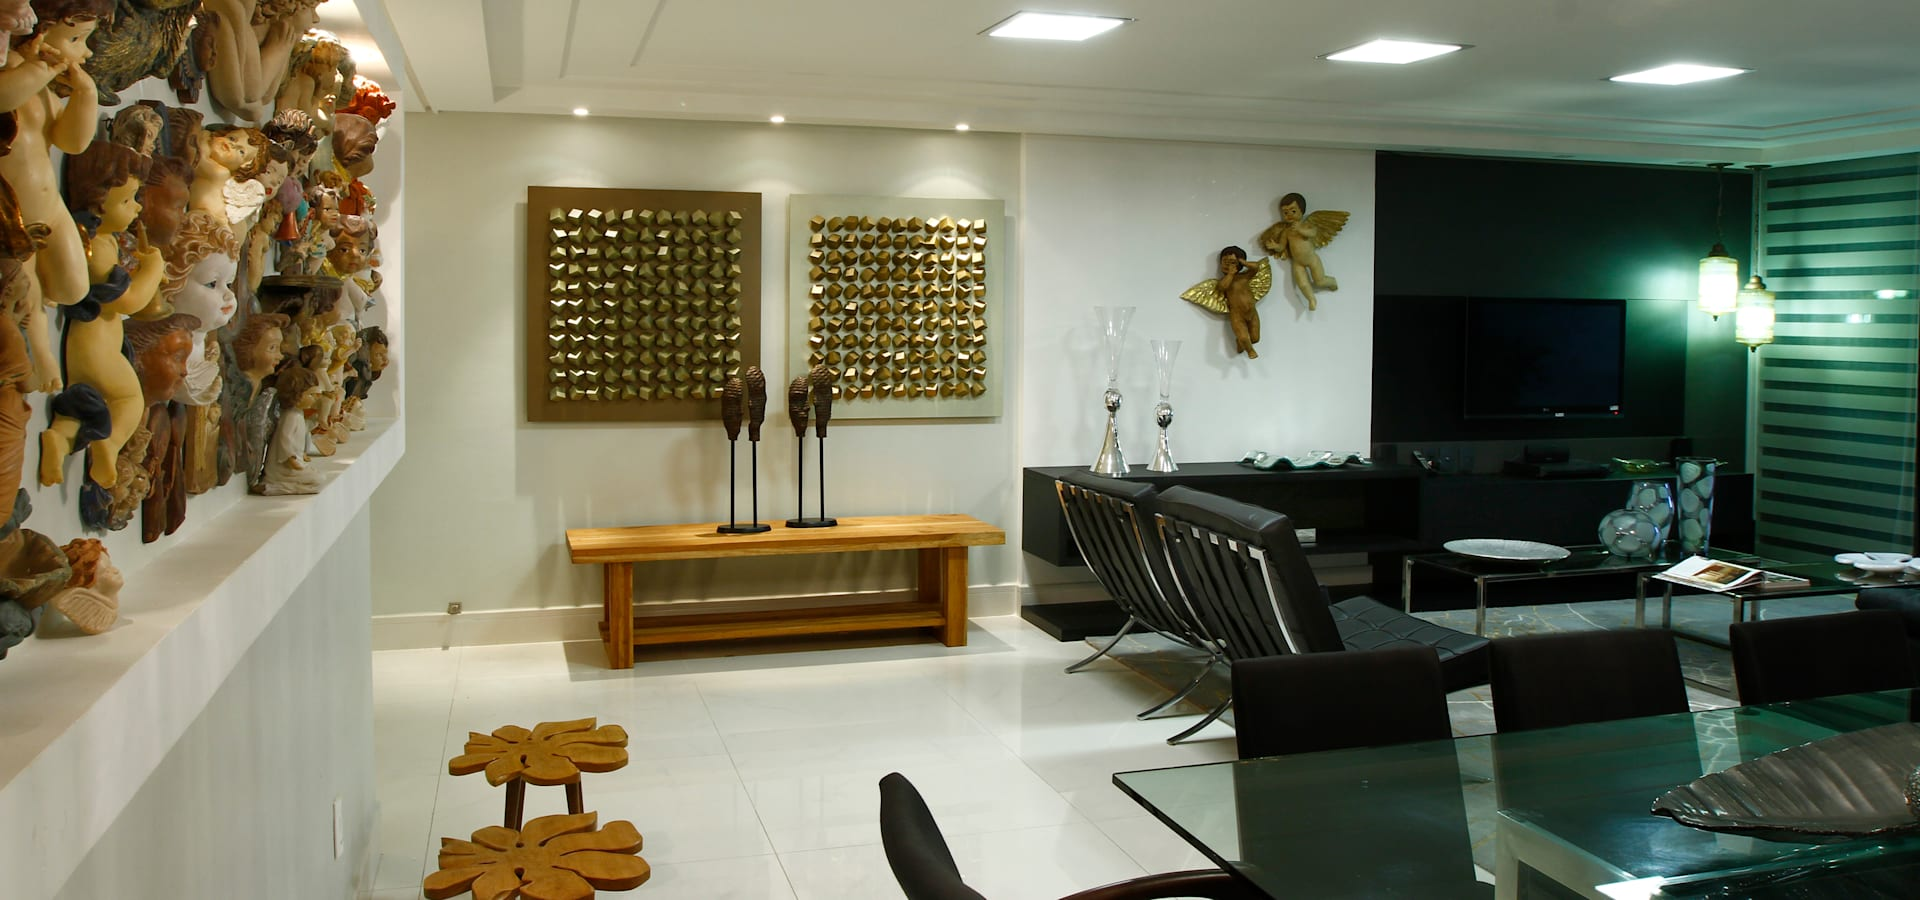 Celia Beatriz Arquitetura